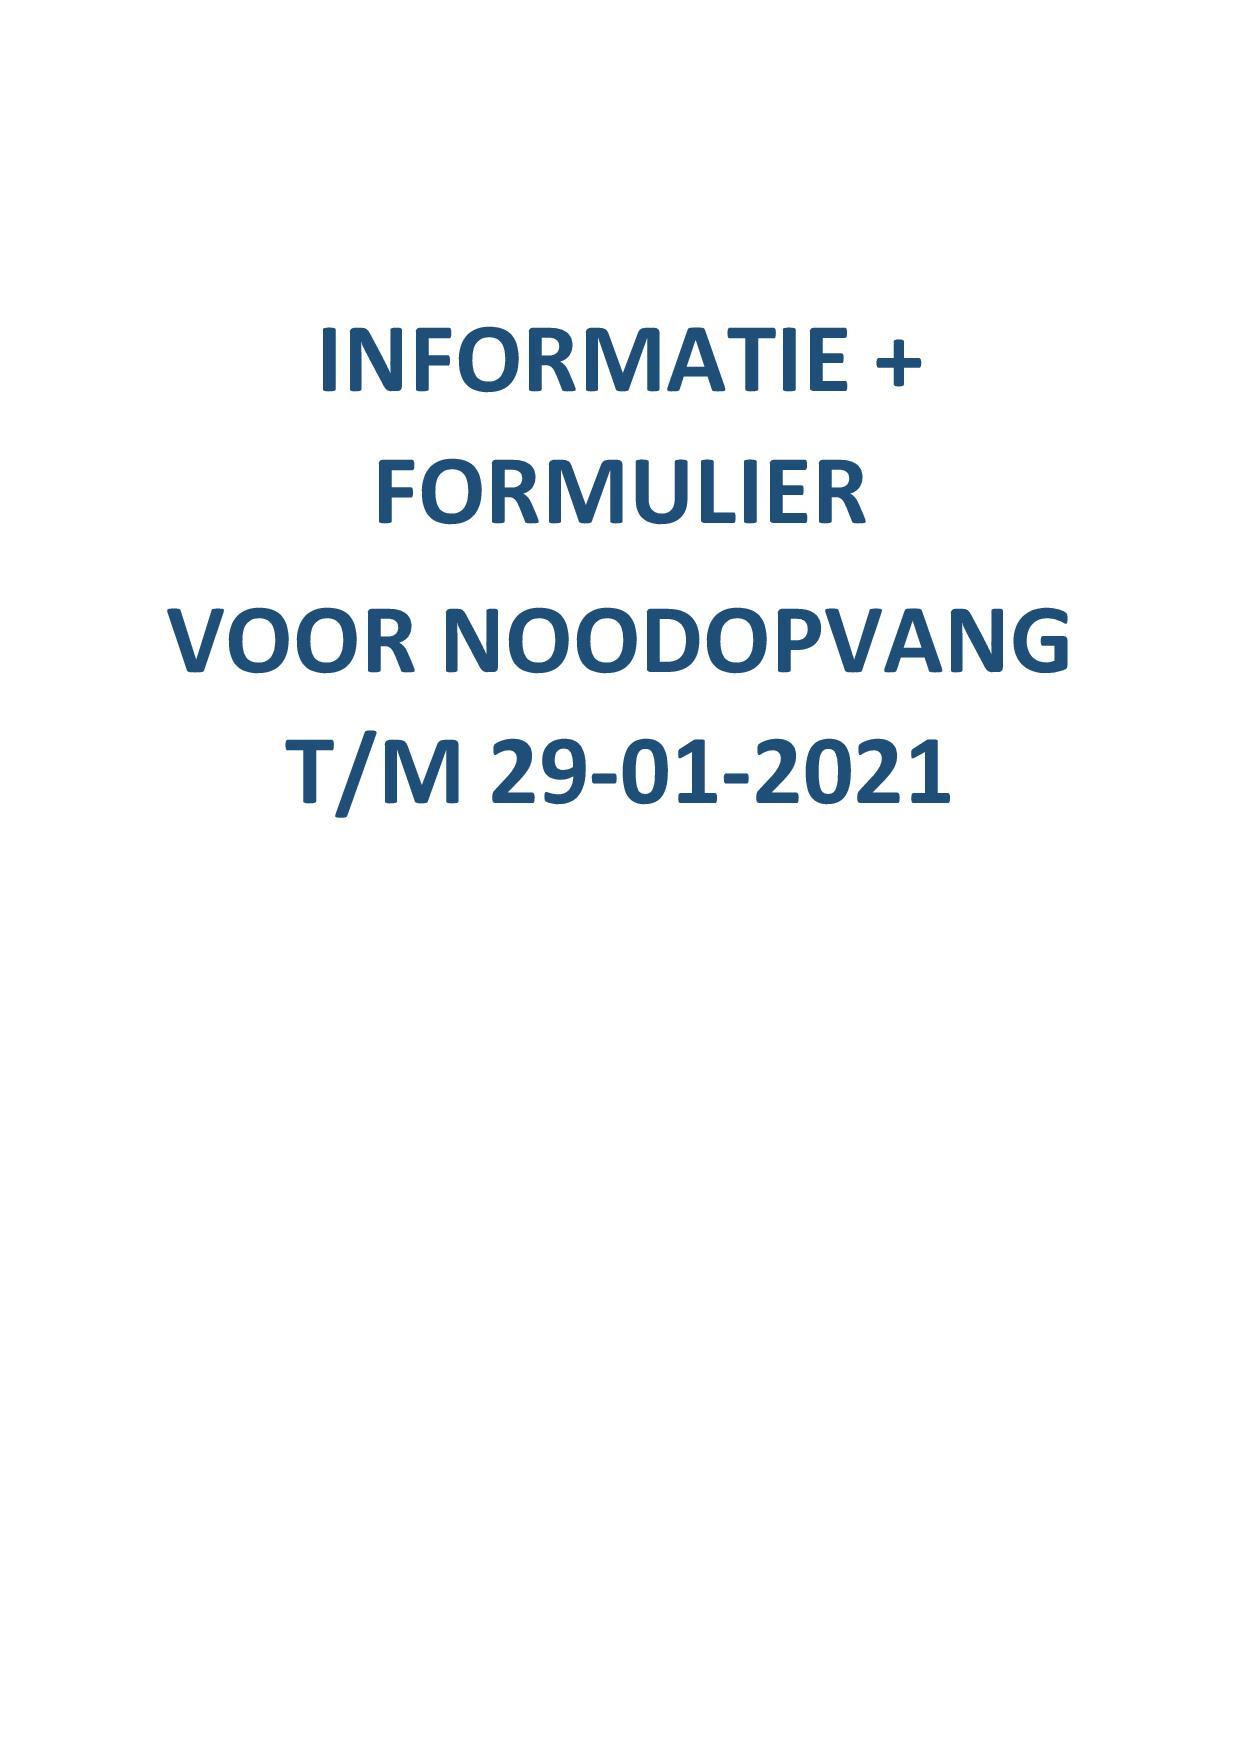 INFORMATIE Page 001